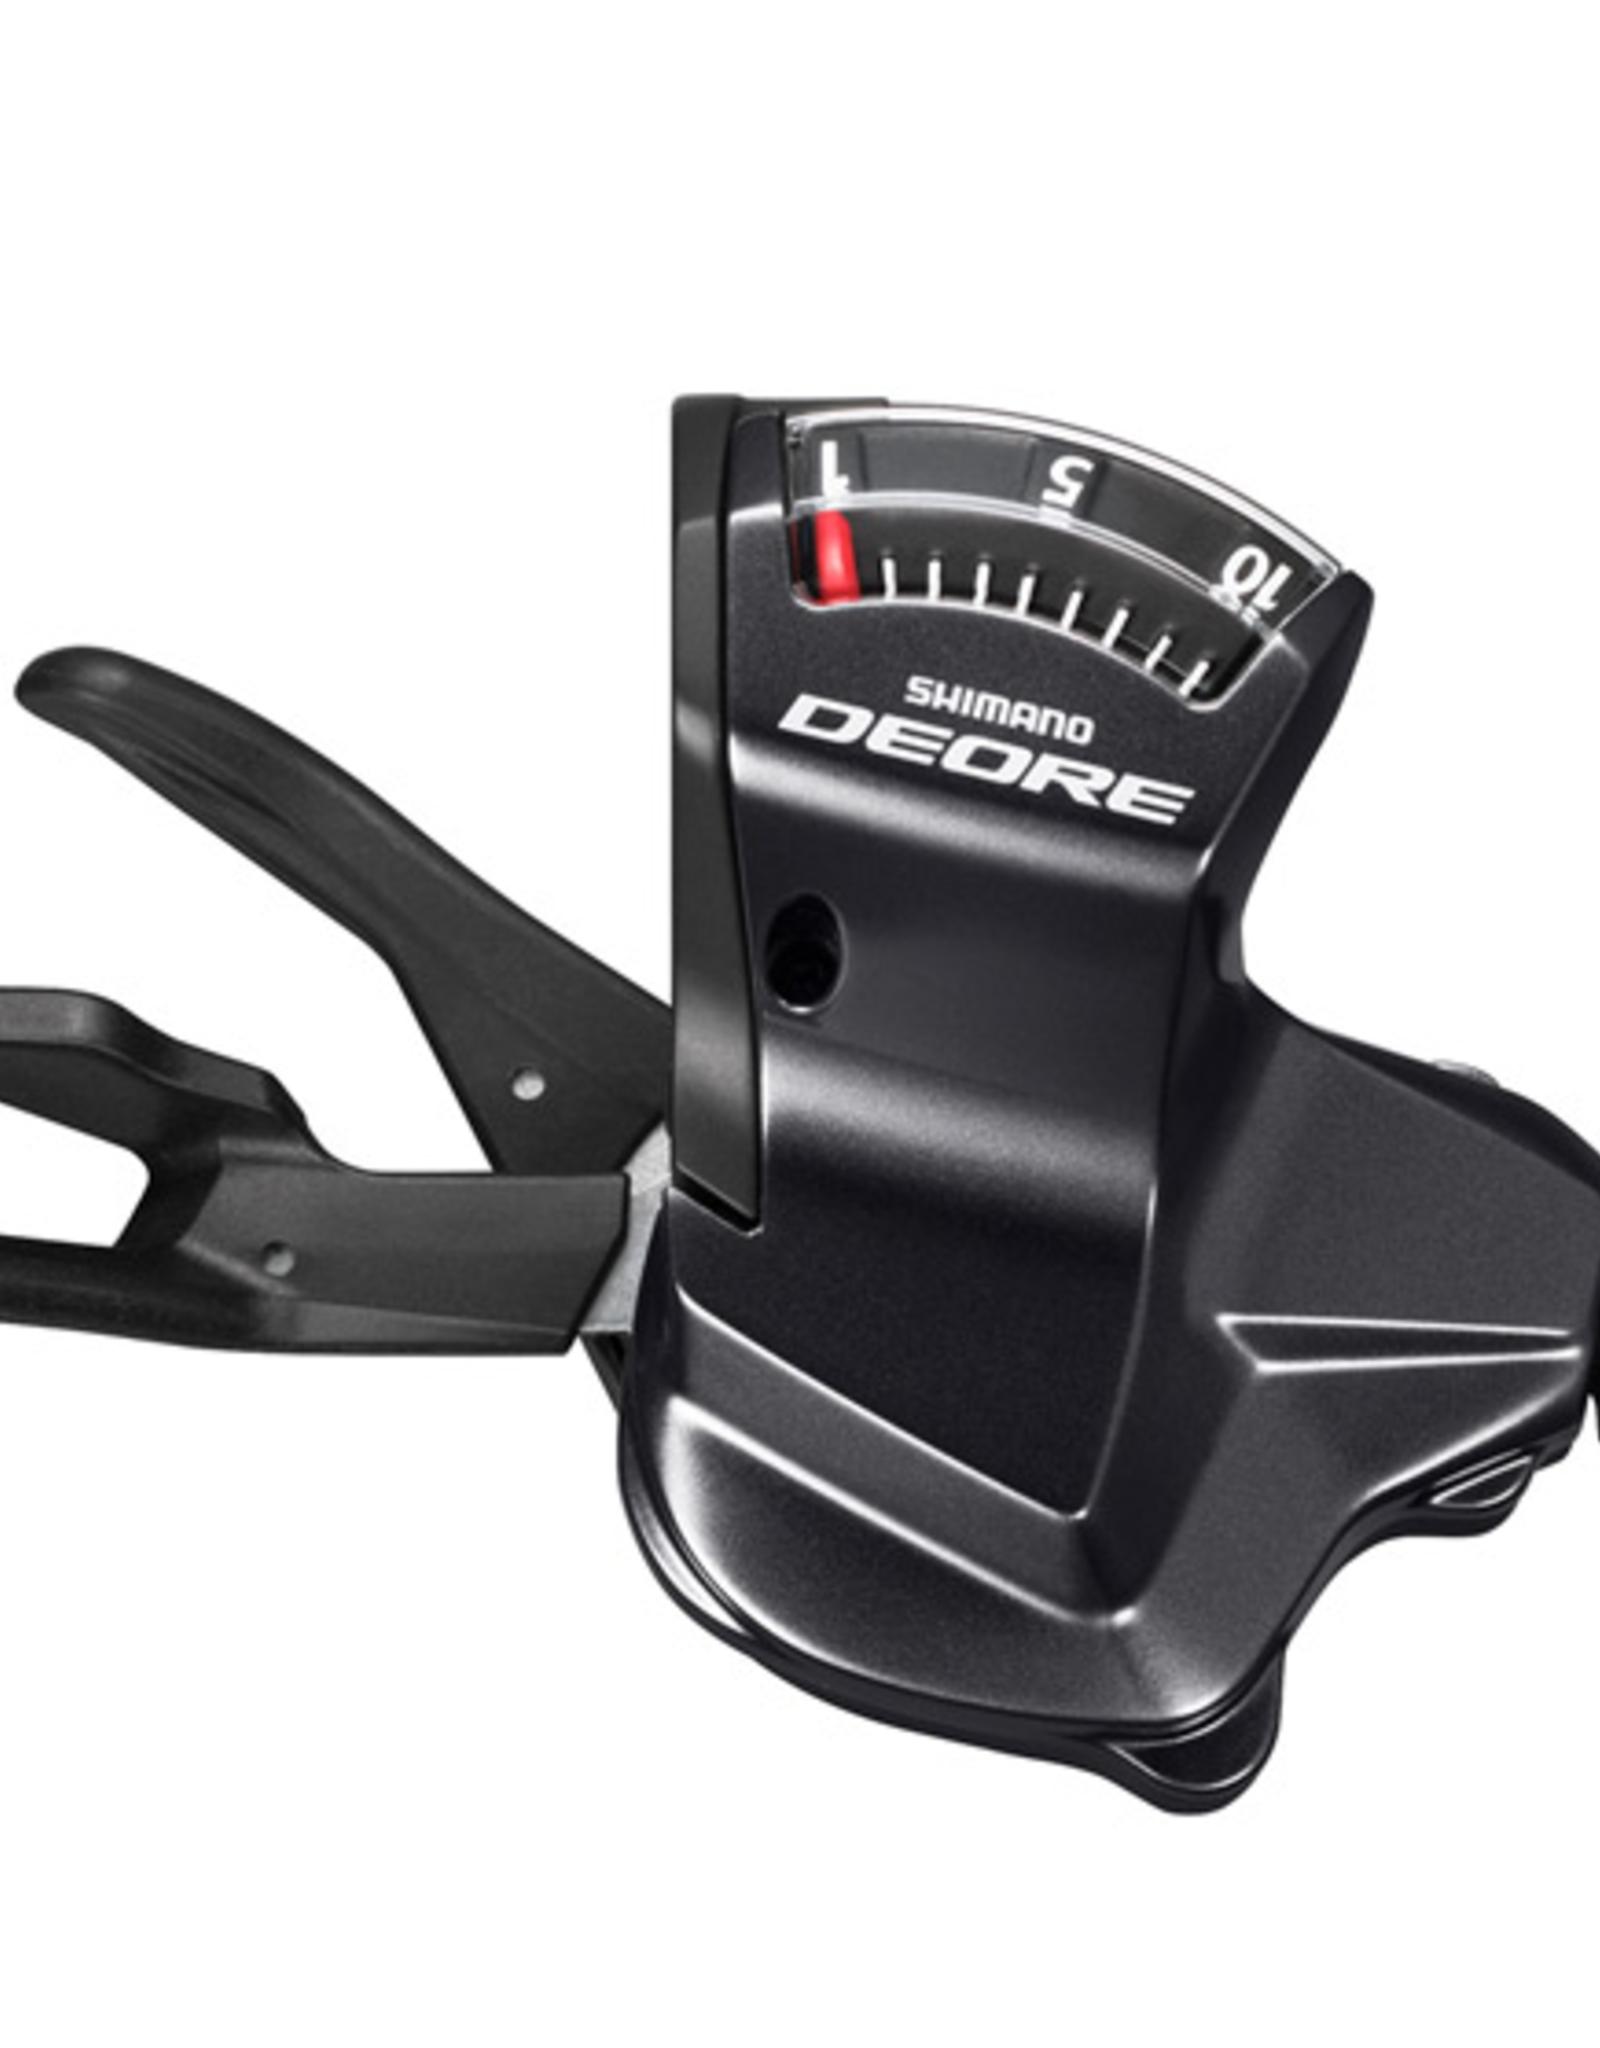 Shimano Shimano Deore SL-T6000-RH 10 speed shifter